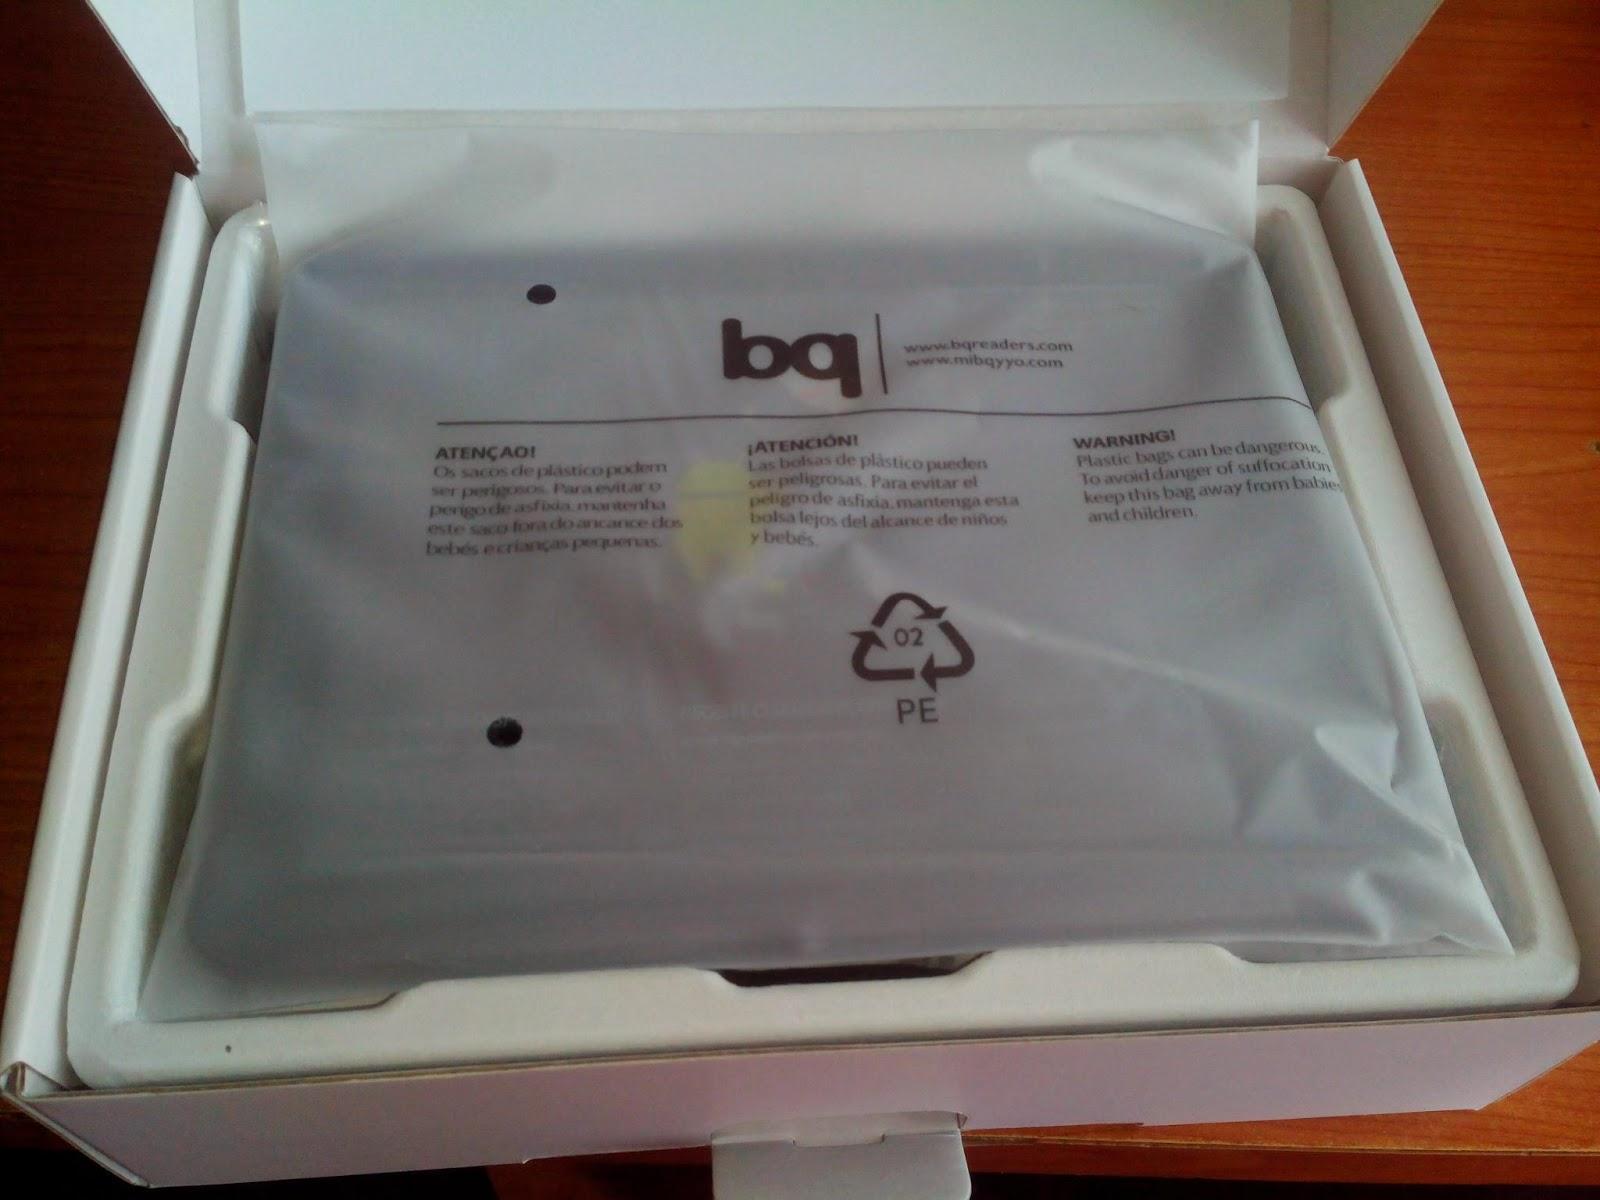 Tablet BQ Curie 2 quadcore interior caja con tablet